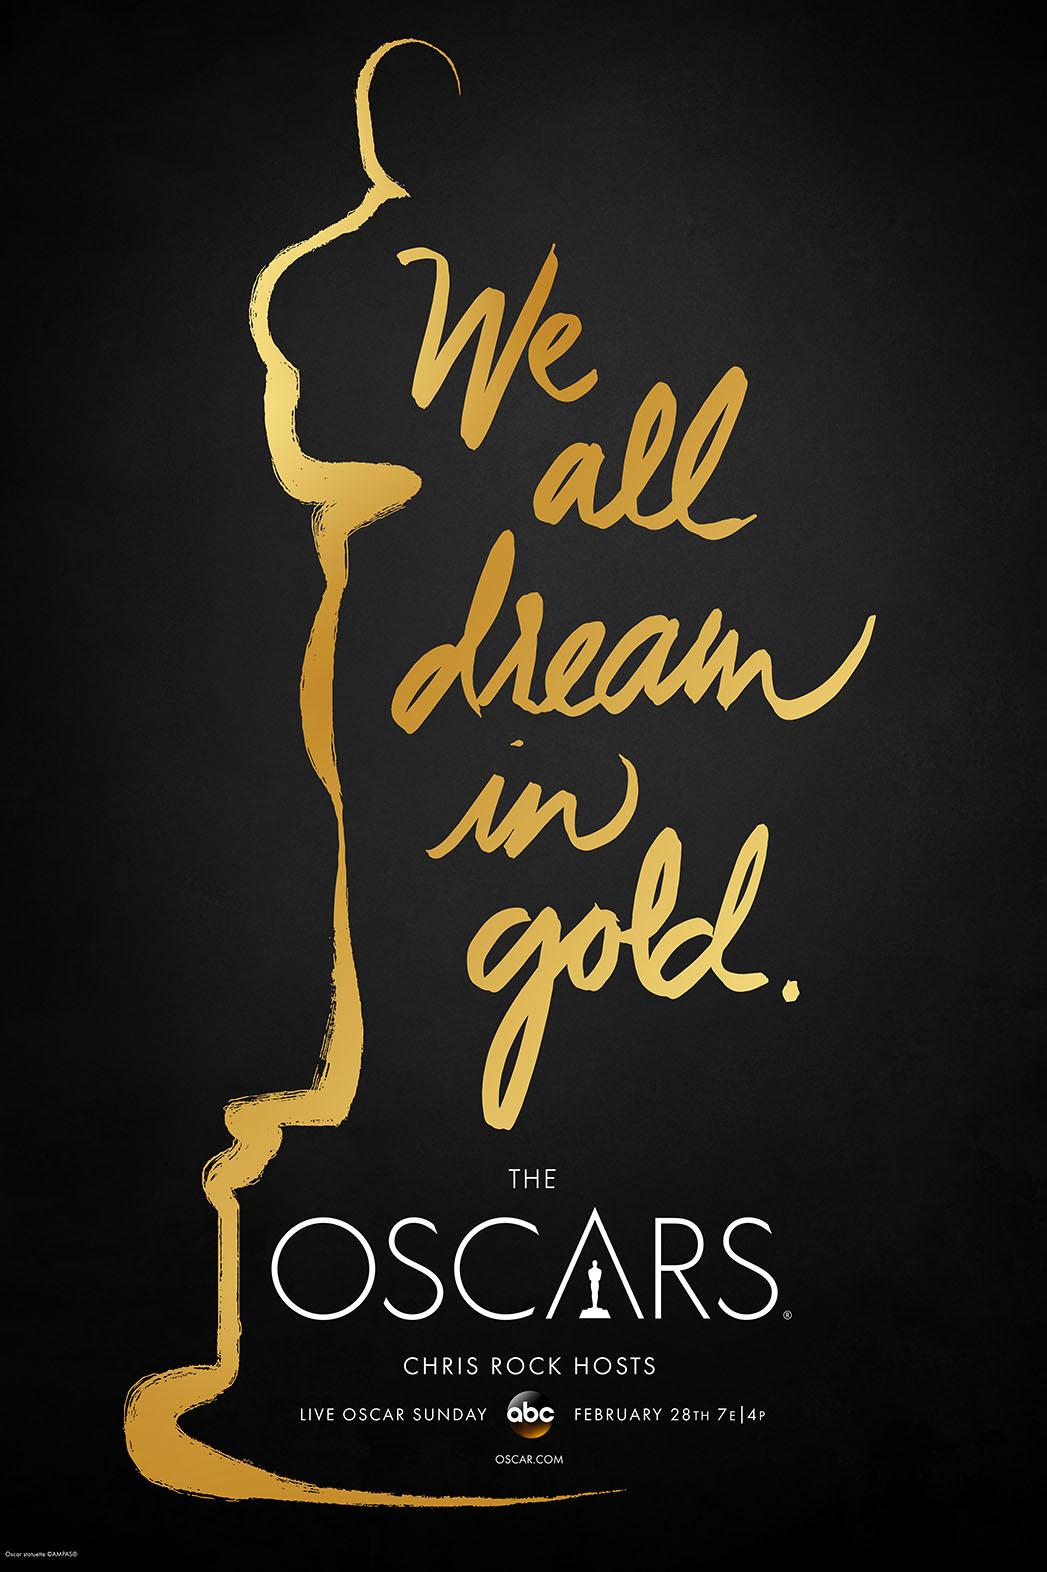 88th Oscars Key Statuette Poster  - P 2016